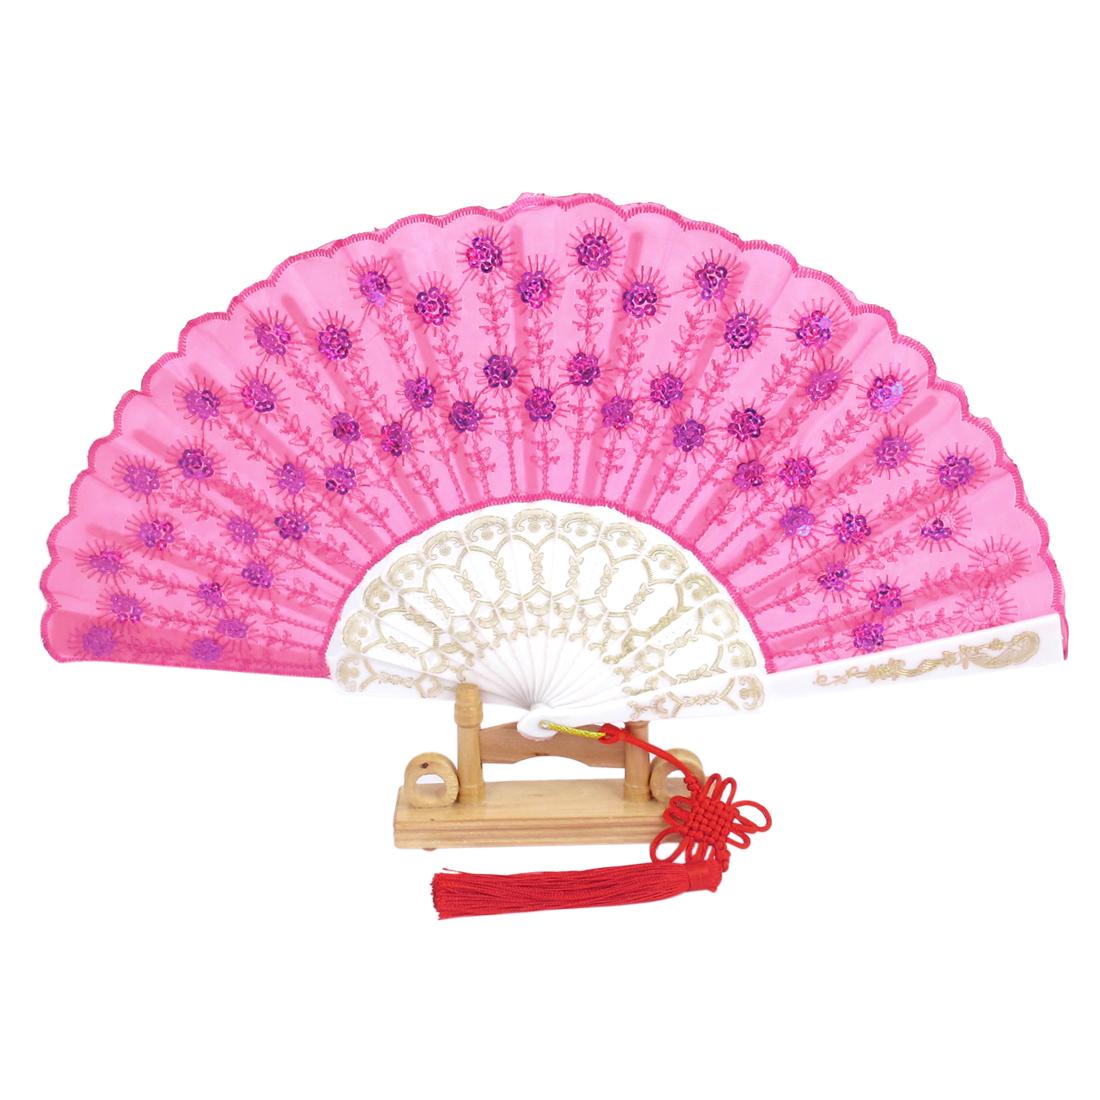 Chinese Knot Sequins Decor Plastic Ribs Folding Hand Fan Fuchsia w Wood Base